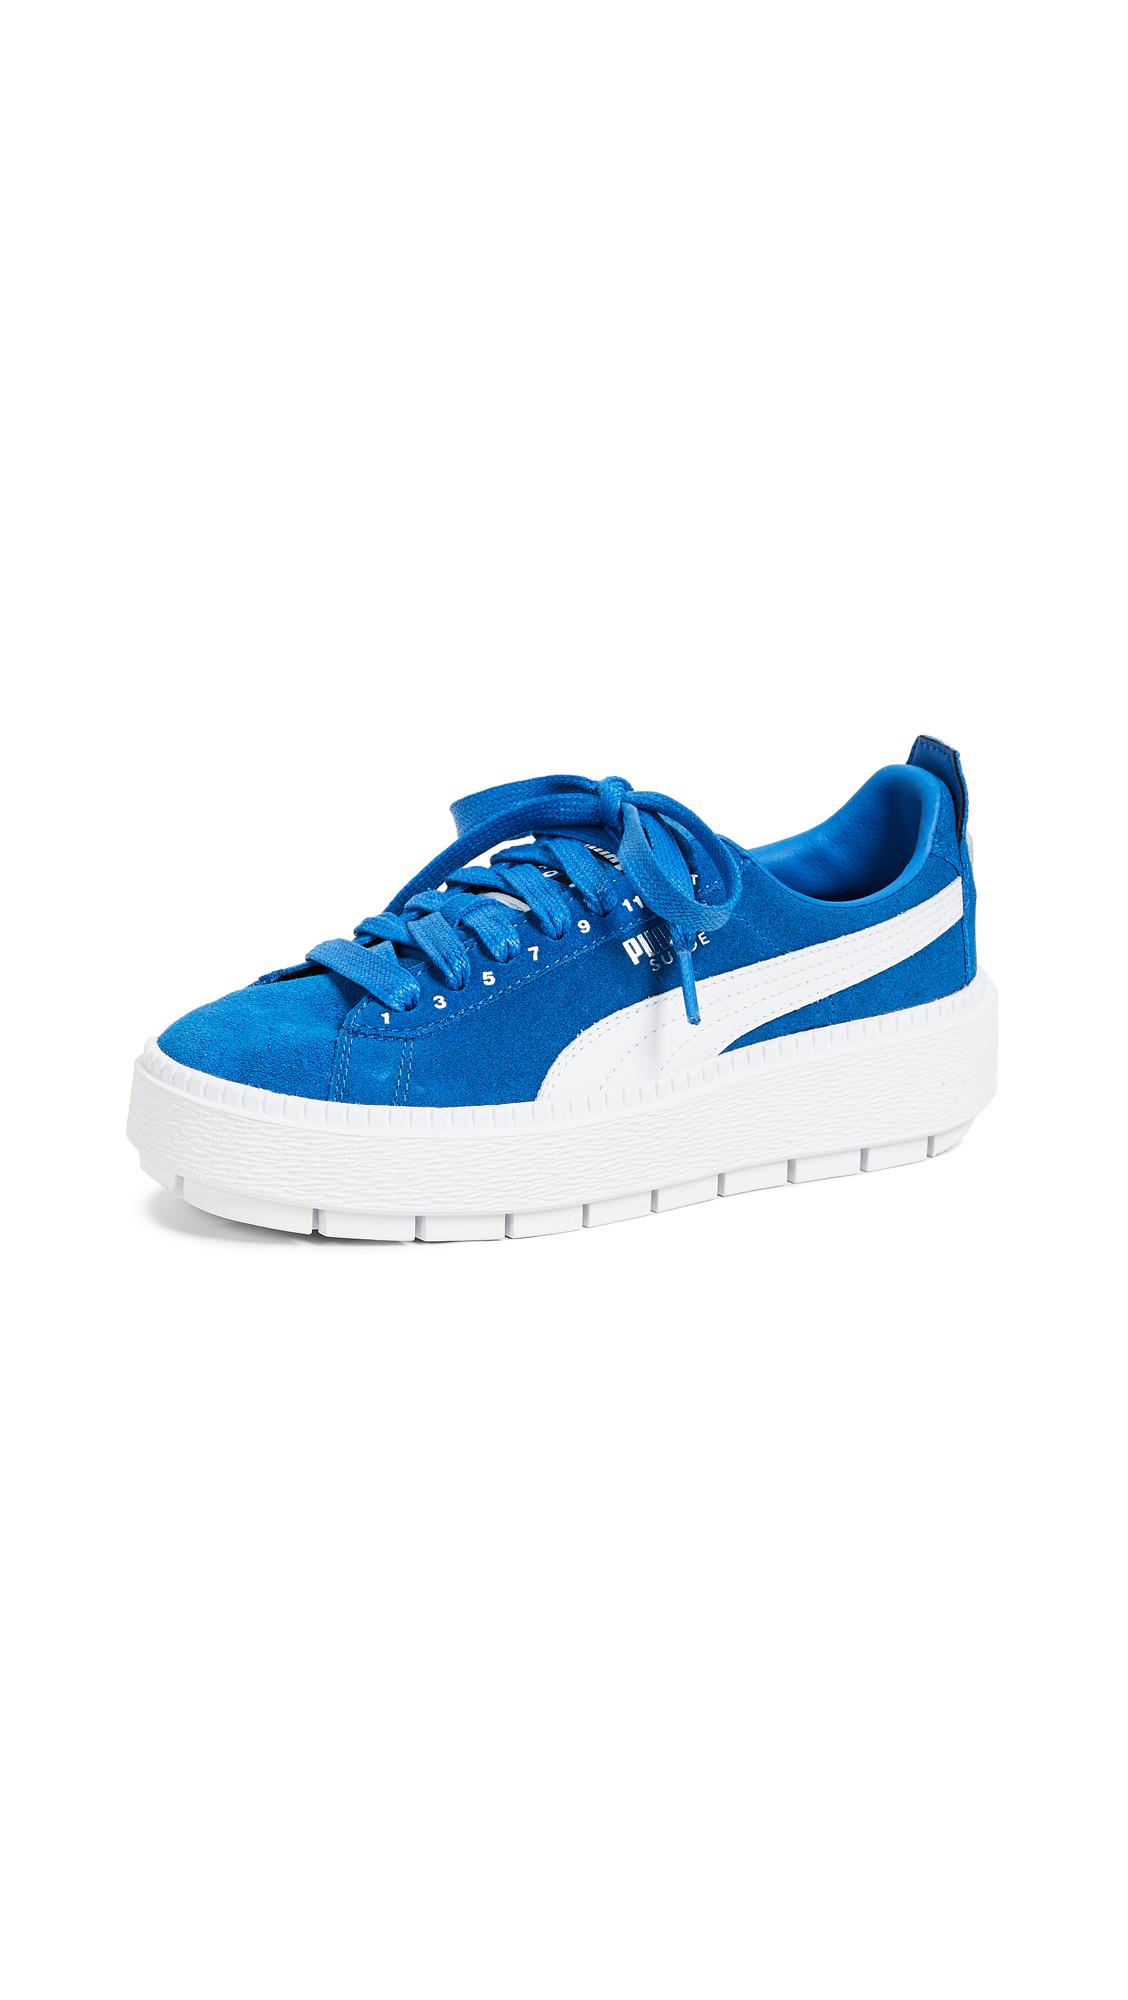 PUMA x Ader Error Platform Sneakers - Lapis Blue